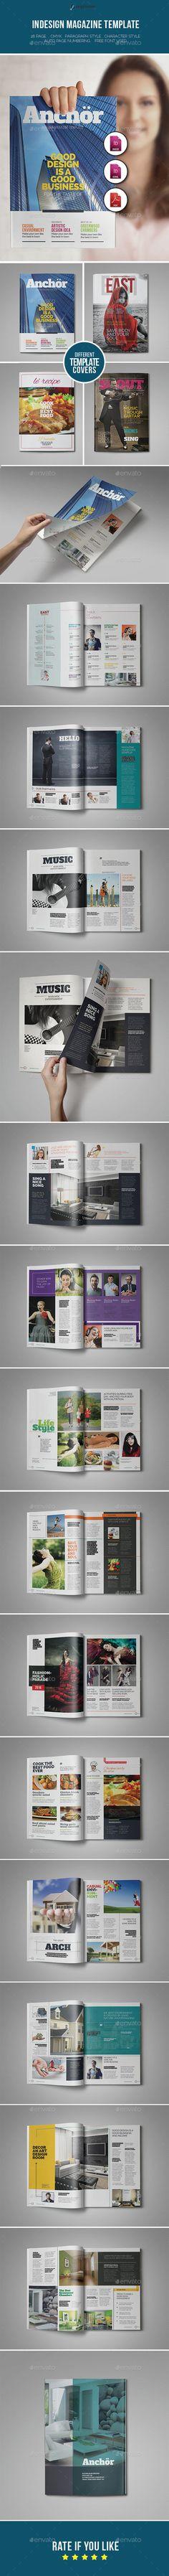 Health Magazine Template InDesign A4 | Best Magazine Templates ...